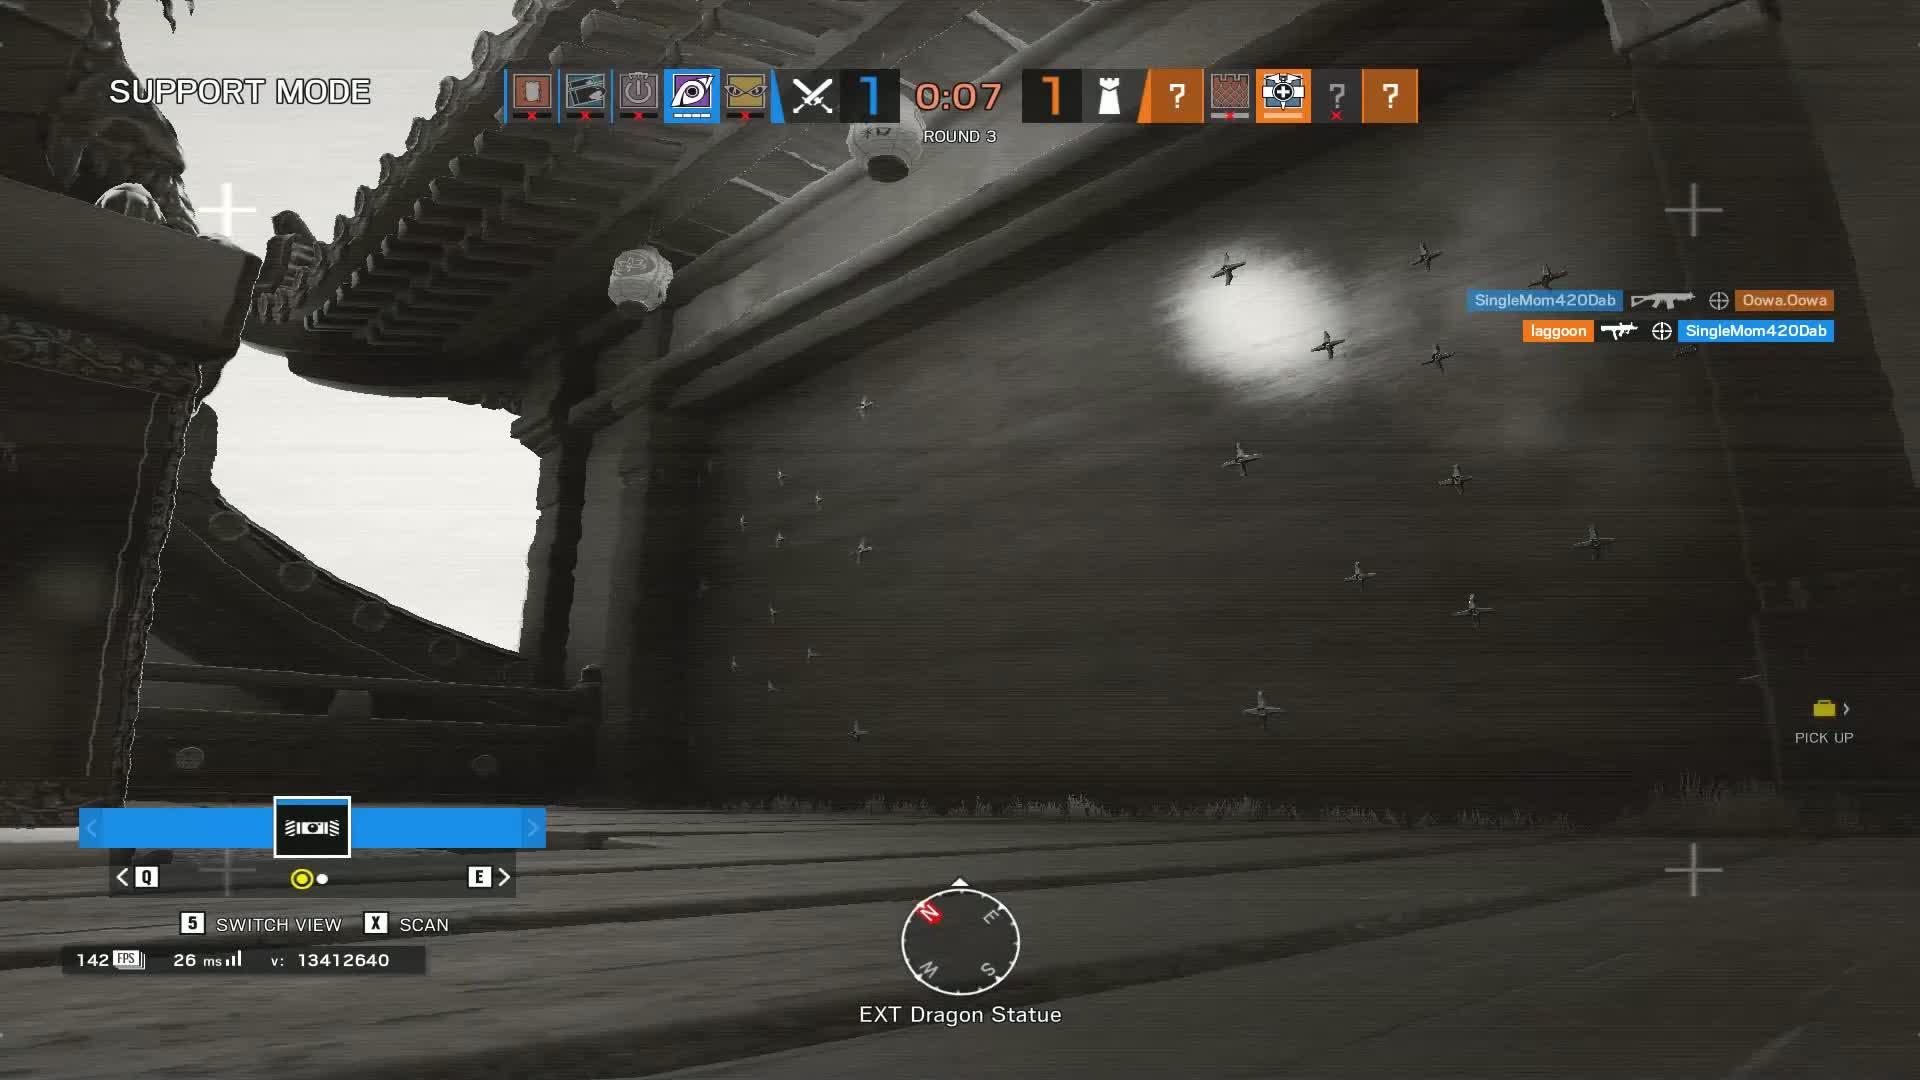 akf, rainbow6, siege, thrower, afk 2 USHI_bot GIFs